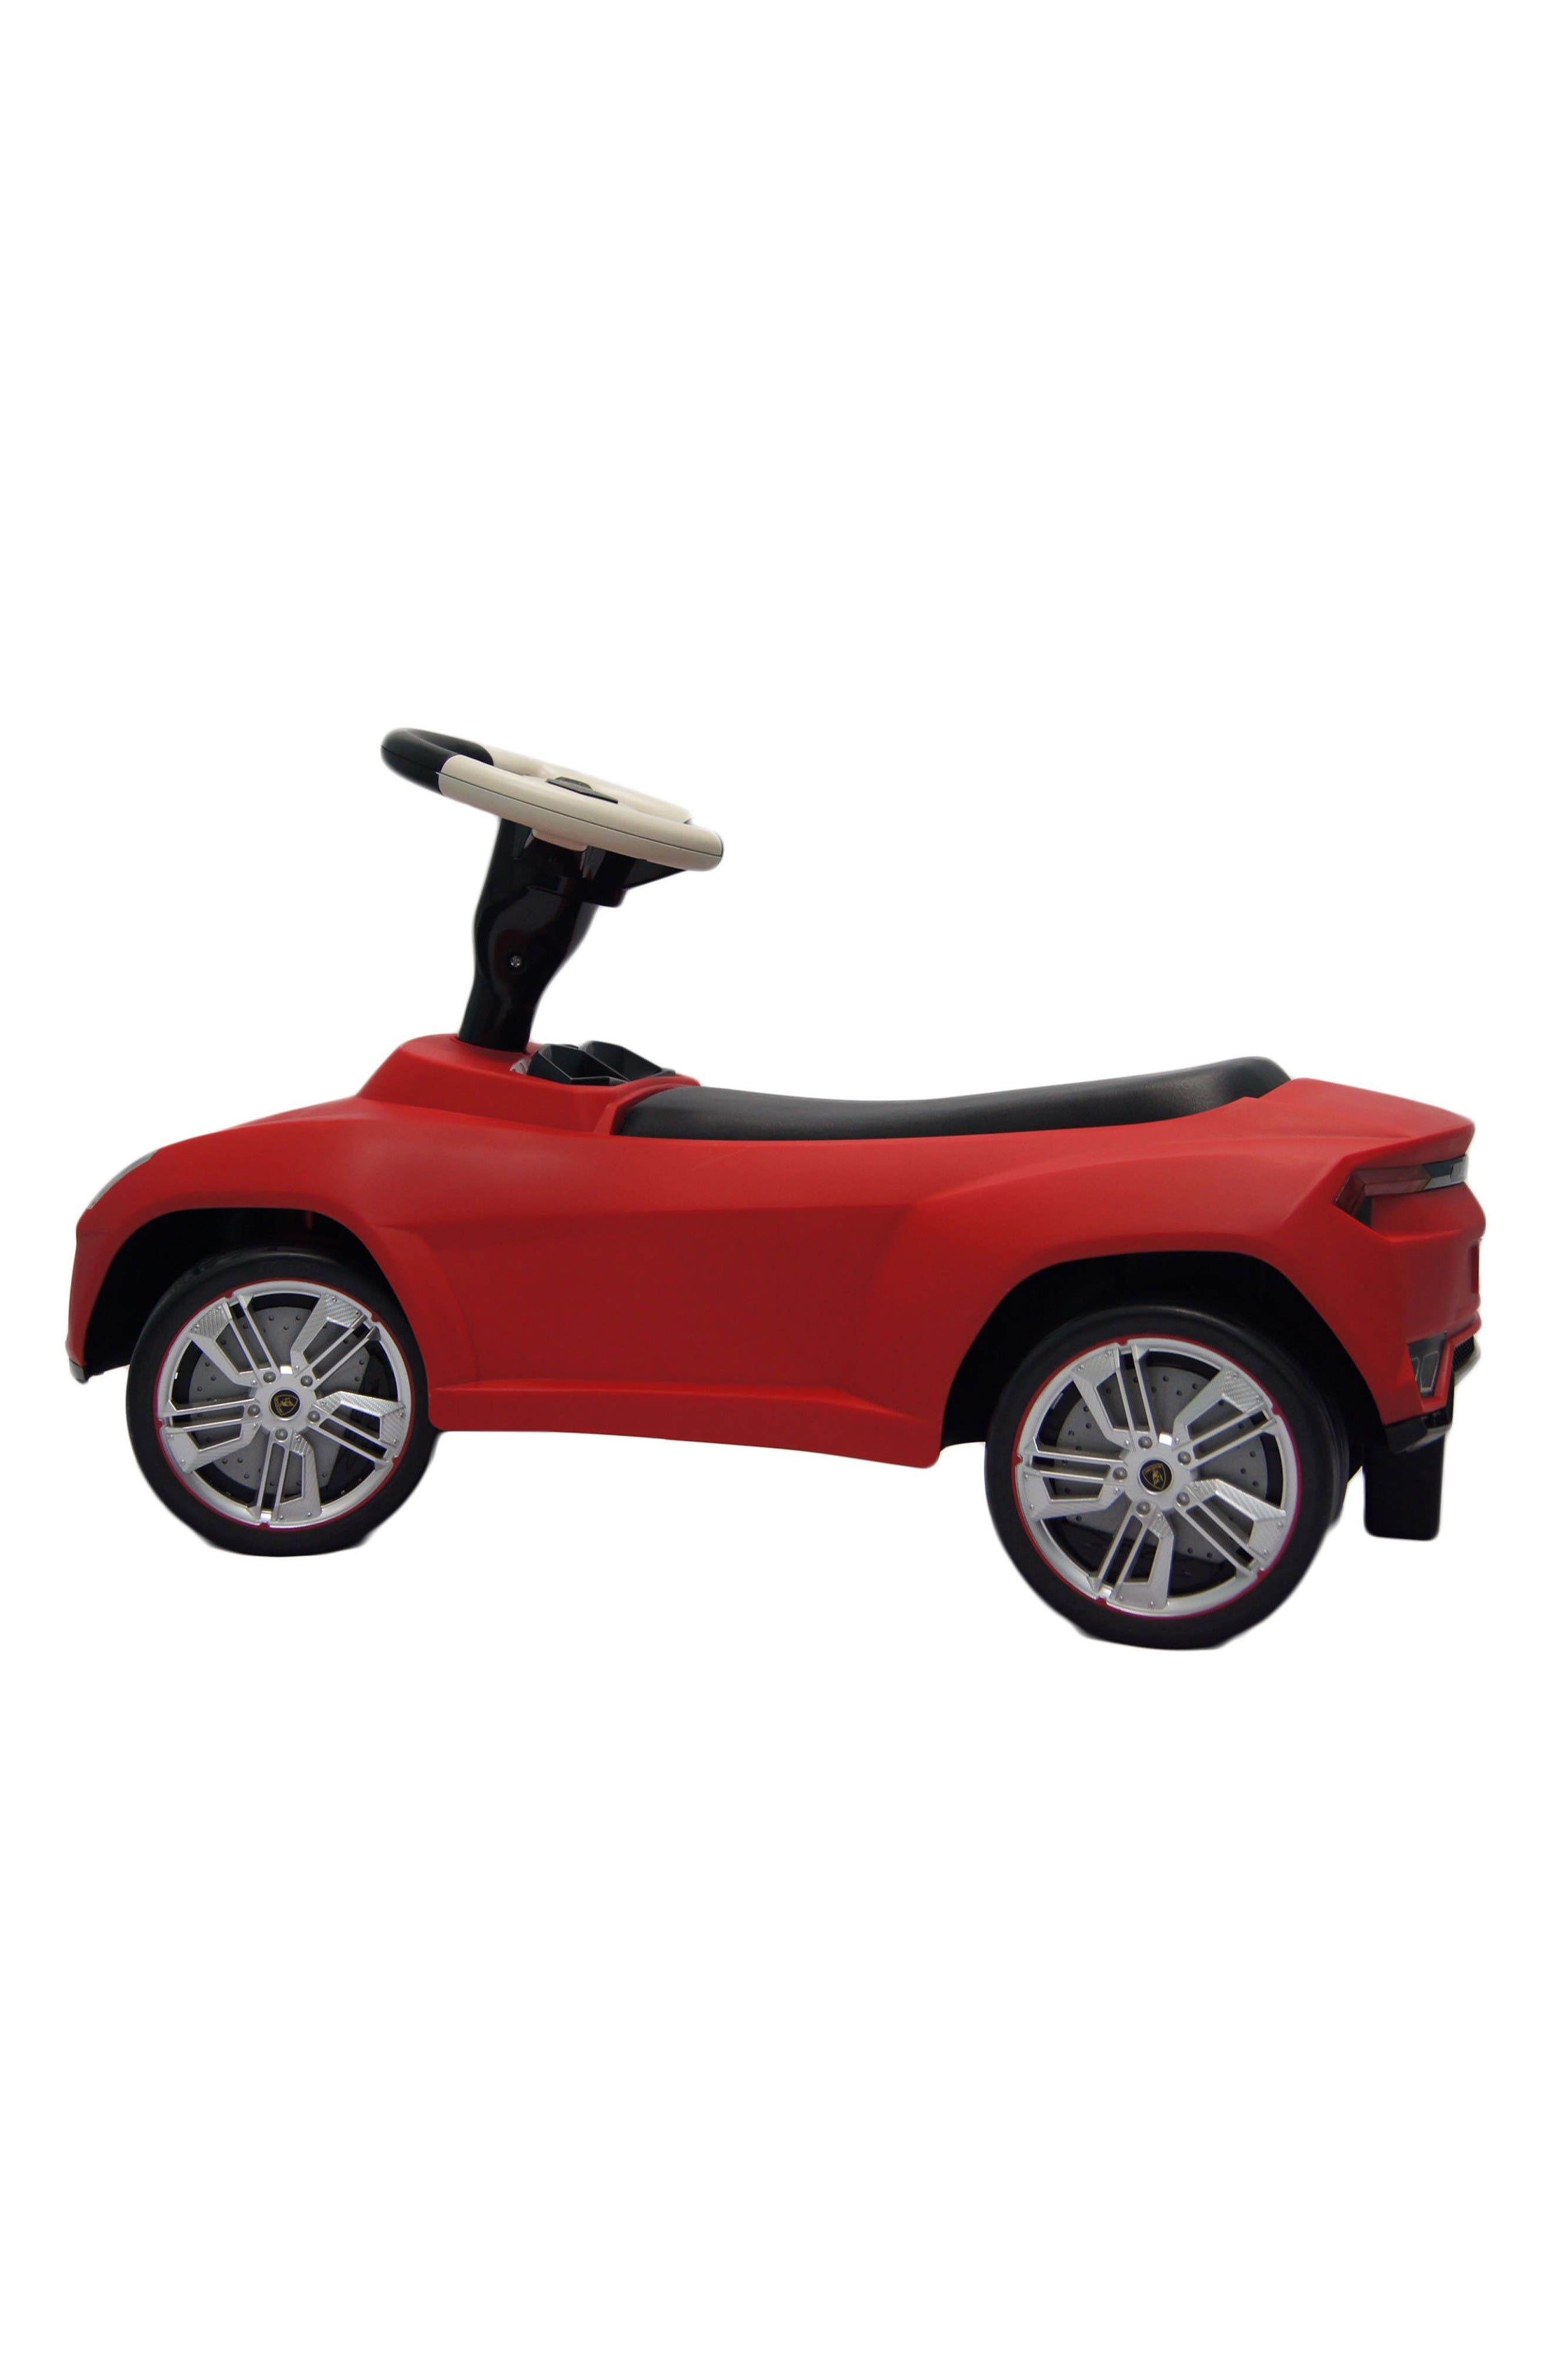 Main Image - Best Ride on Cars Lamborghini Urus Ride-On Push Car